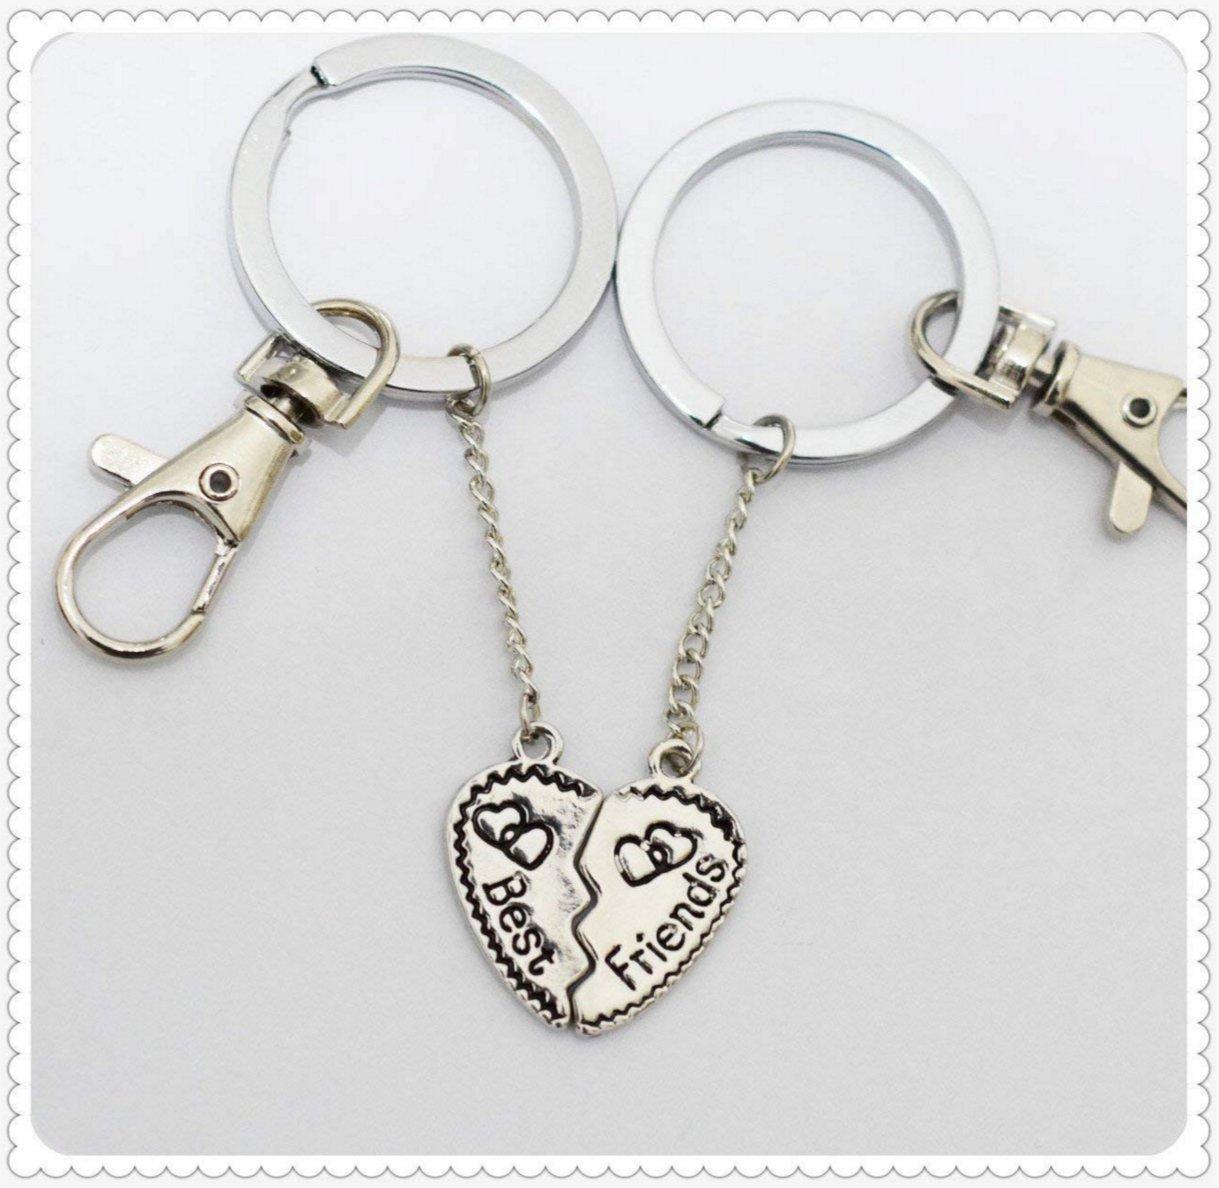 Charm Best Bitches Keychain, Best Friend Keychain, BFF Keychain, Split Heart Keychain, Best Friend Forever Christmas Gift (C)